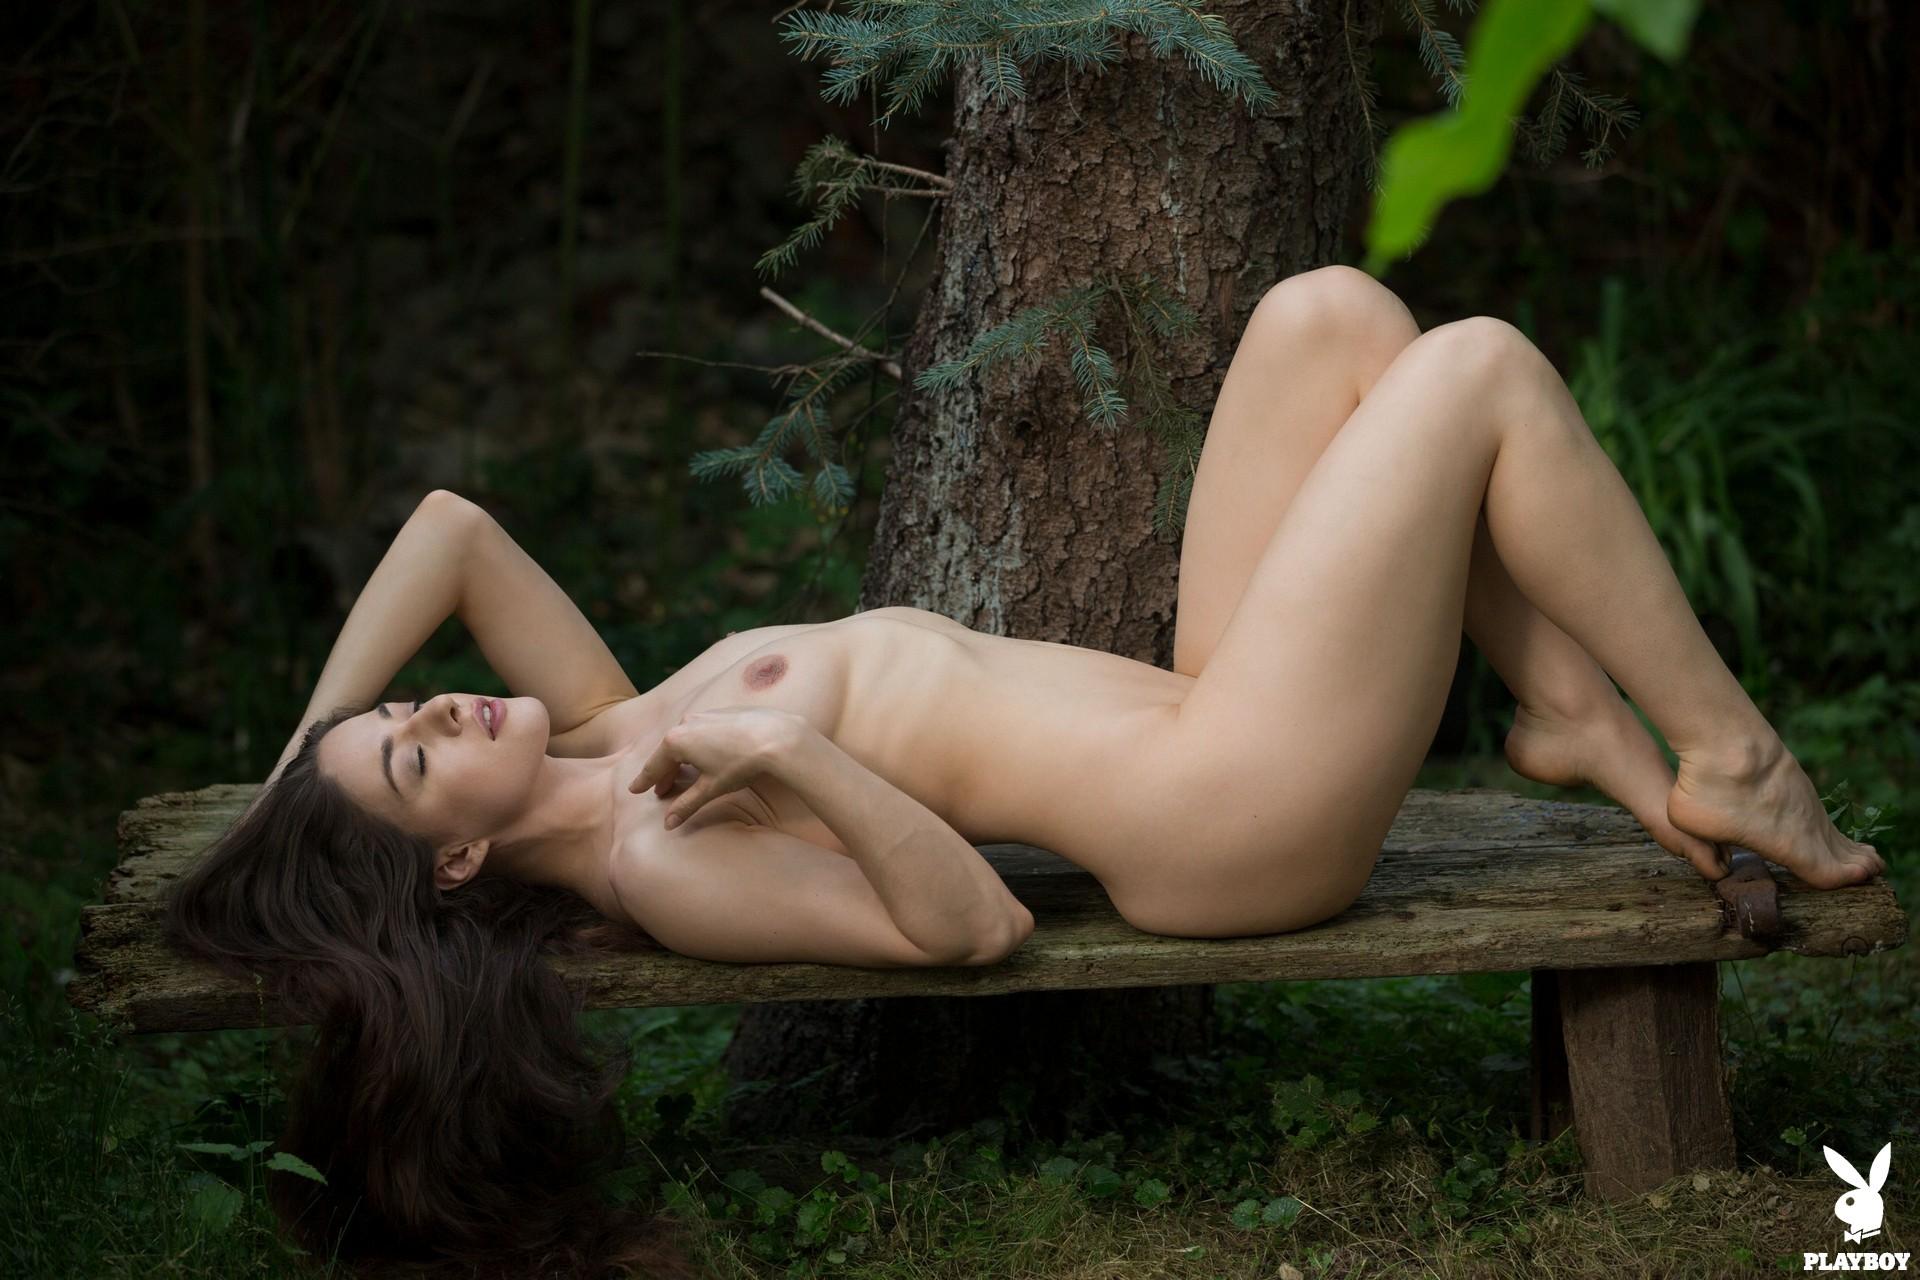 Joy Draiki in Mystic Escape - Playboy Plus 25